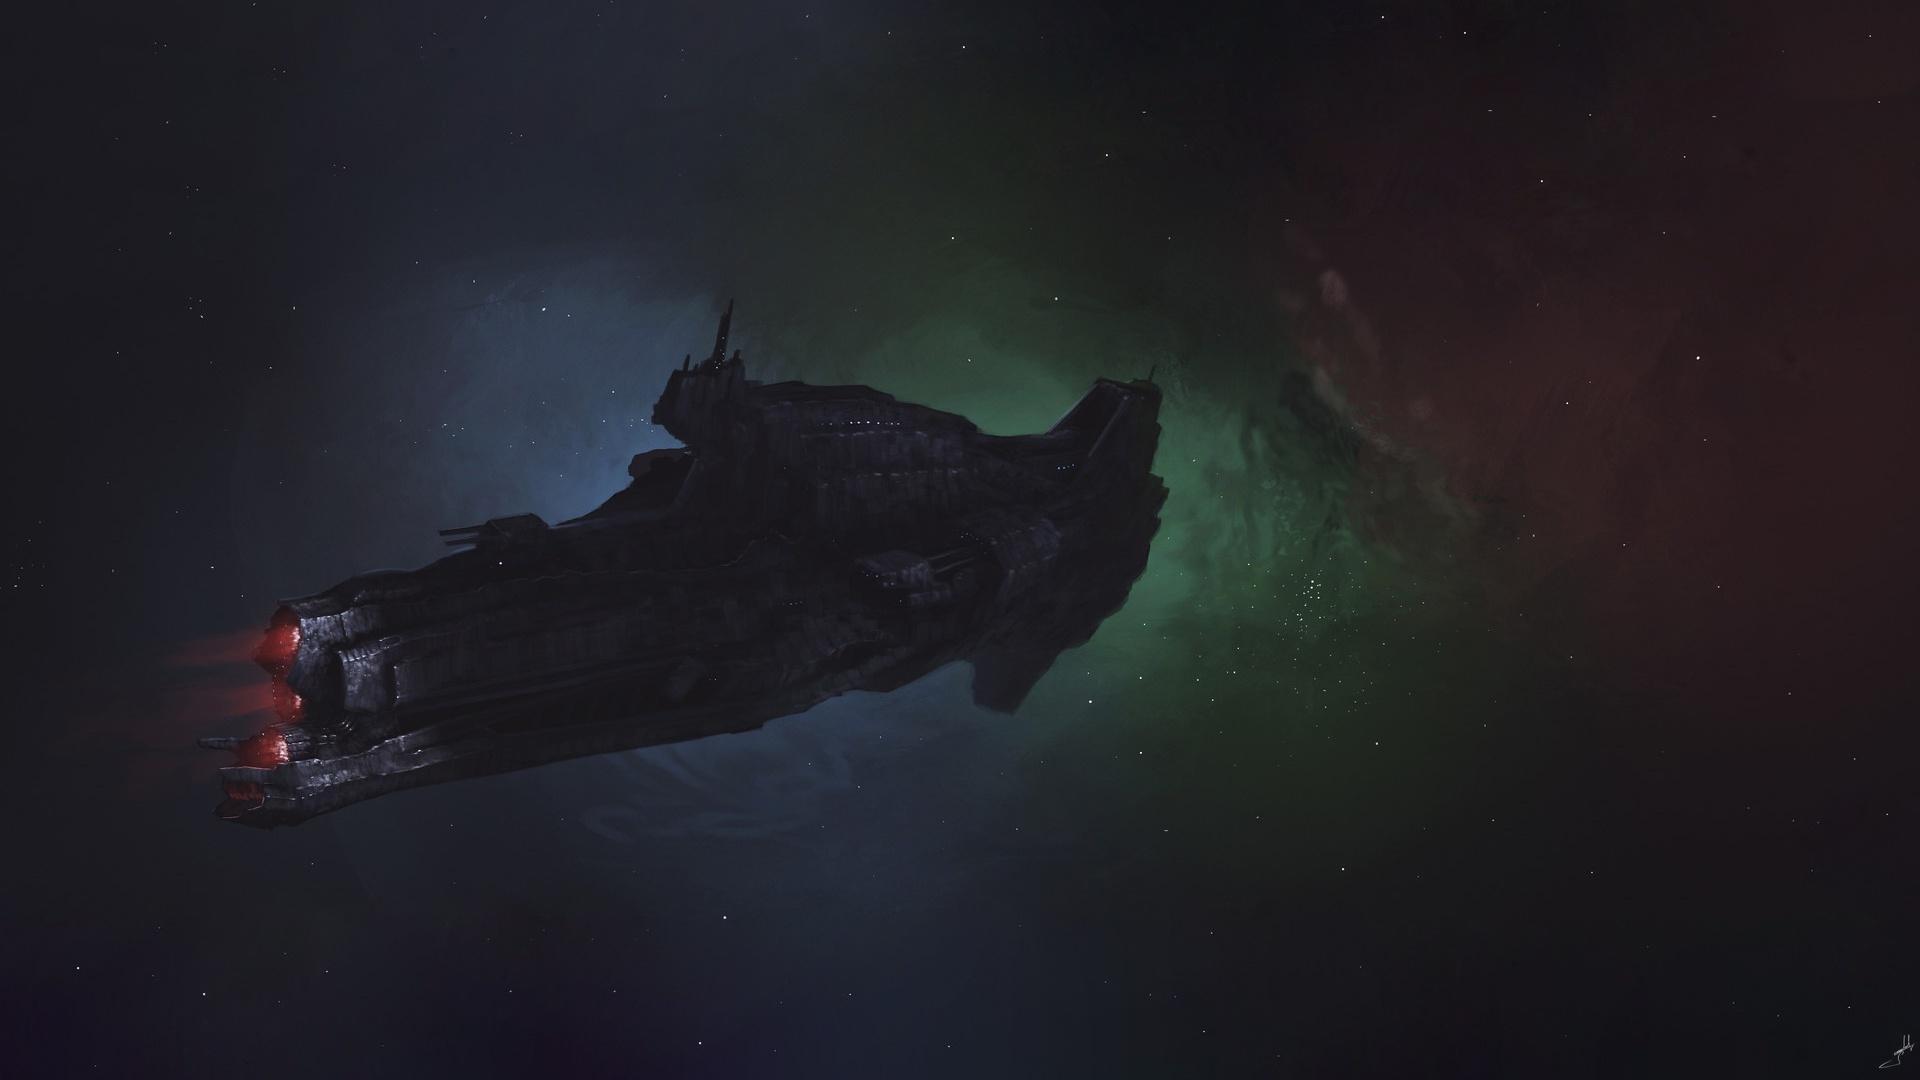 General 1920x1080 spaceship dark science fiction space artwork